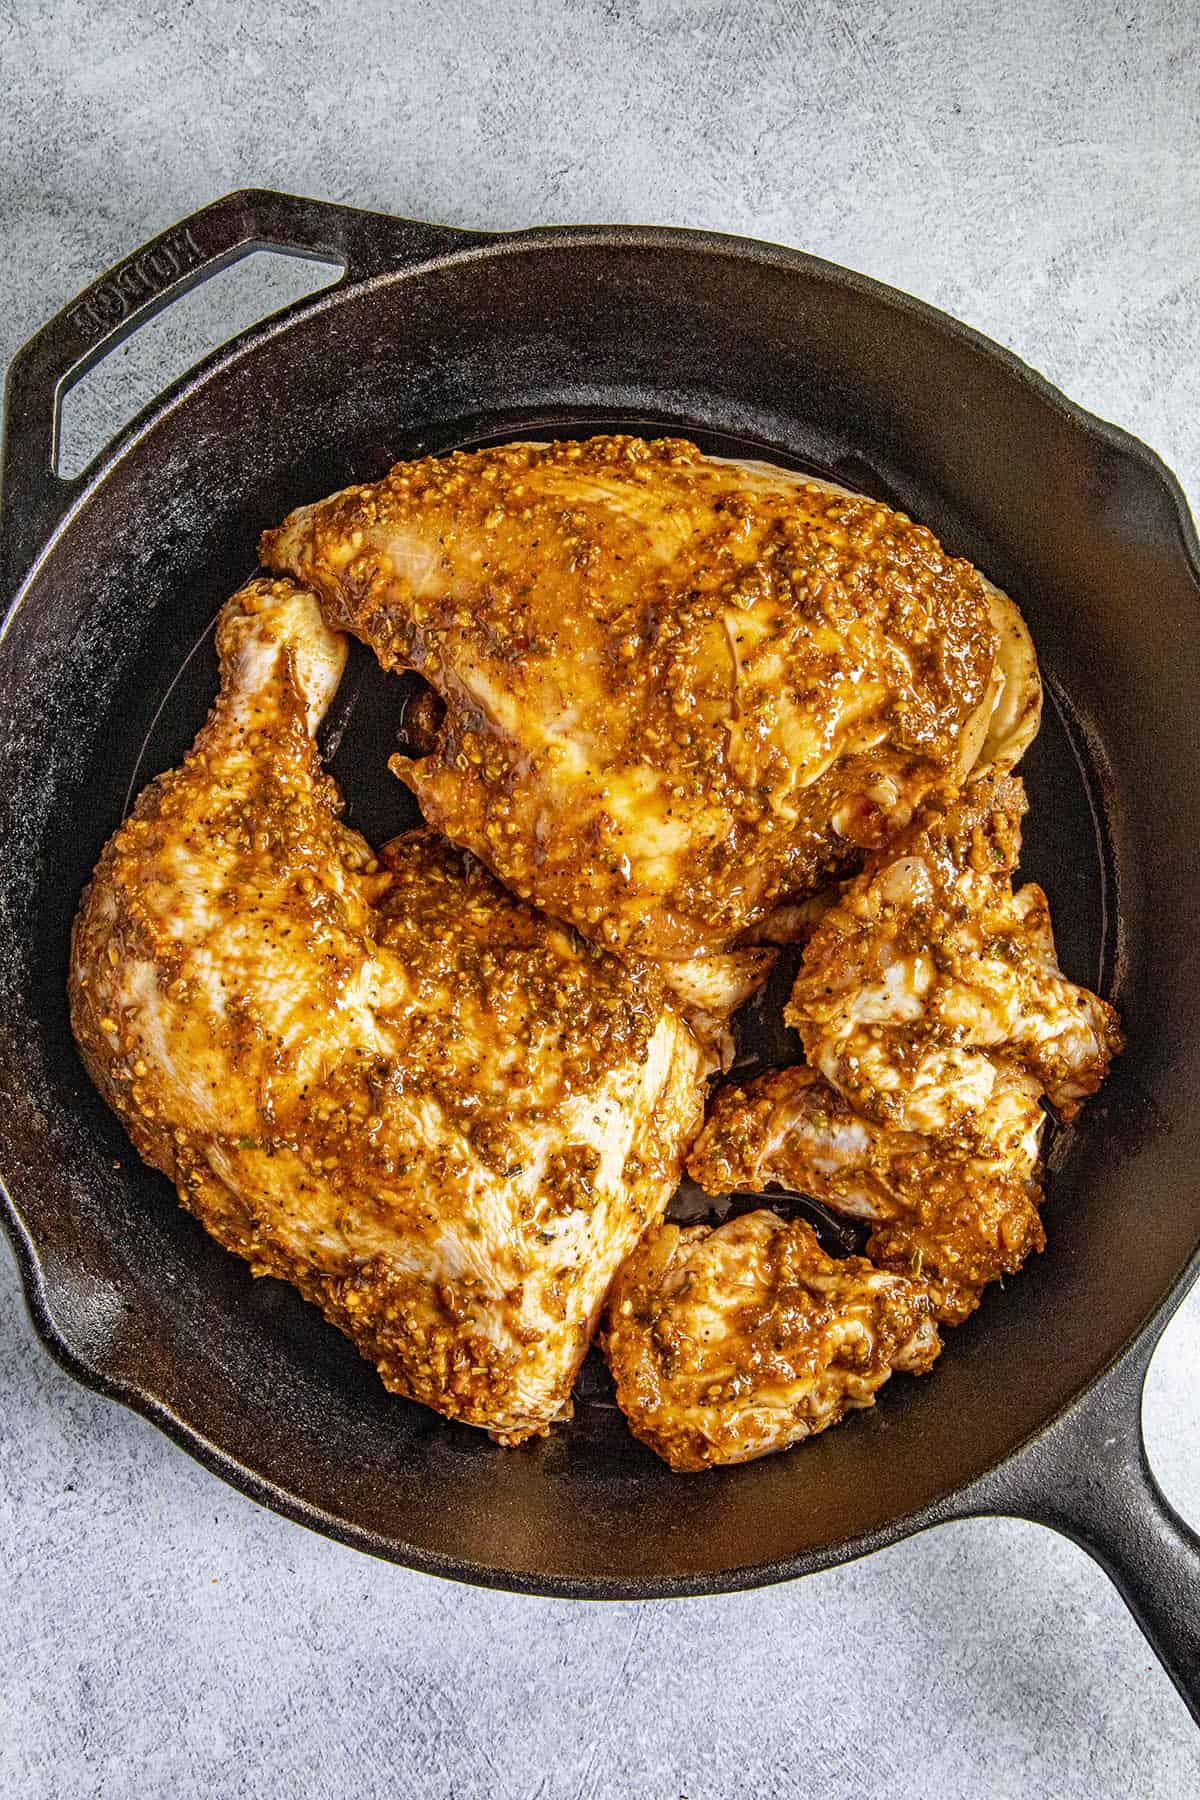 Peruvian Chicken Ready to cook